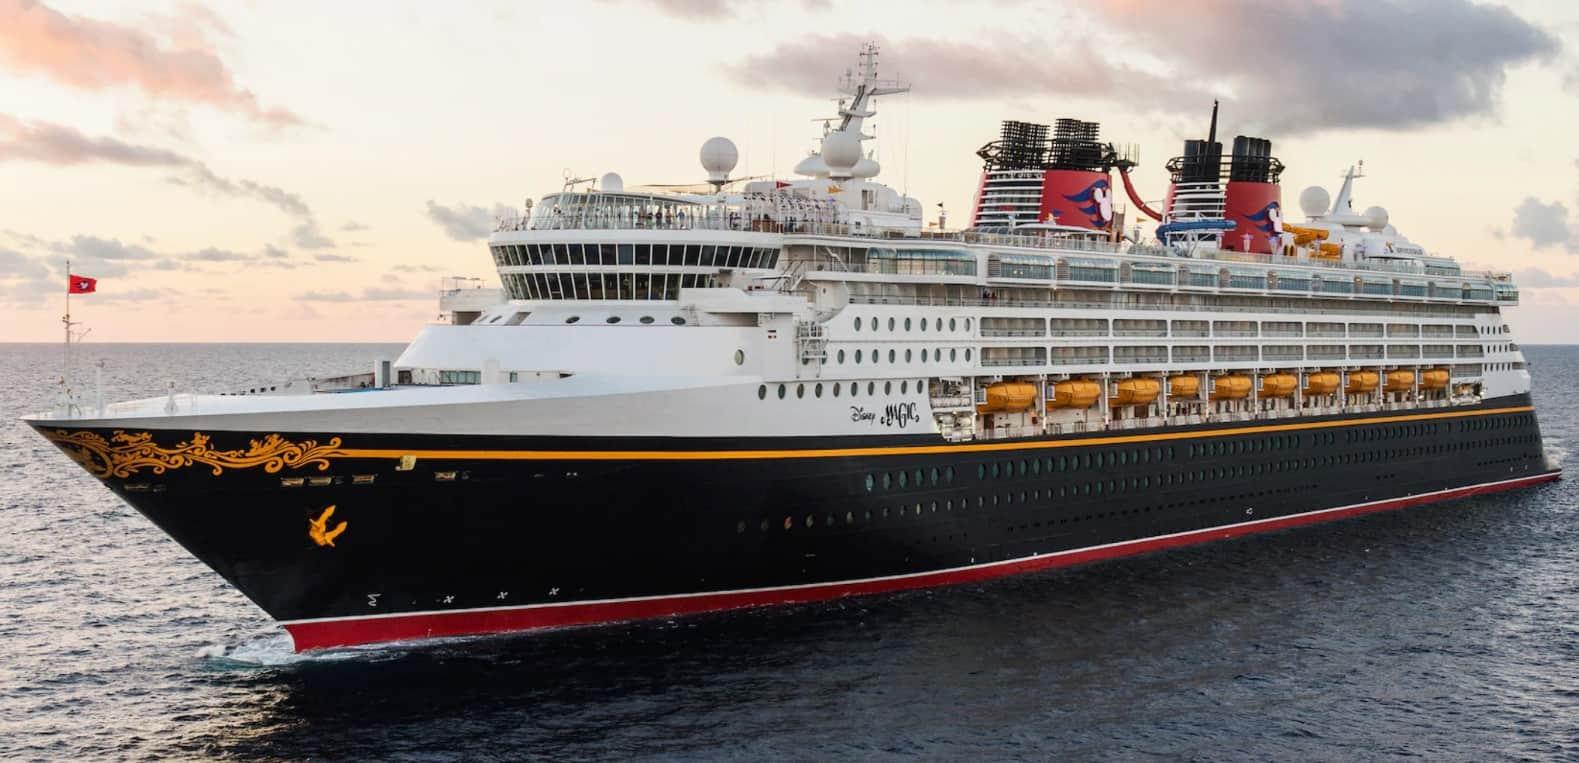 Disney Magic cruise line ship